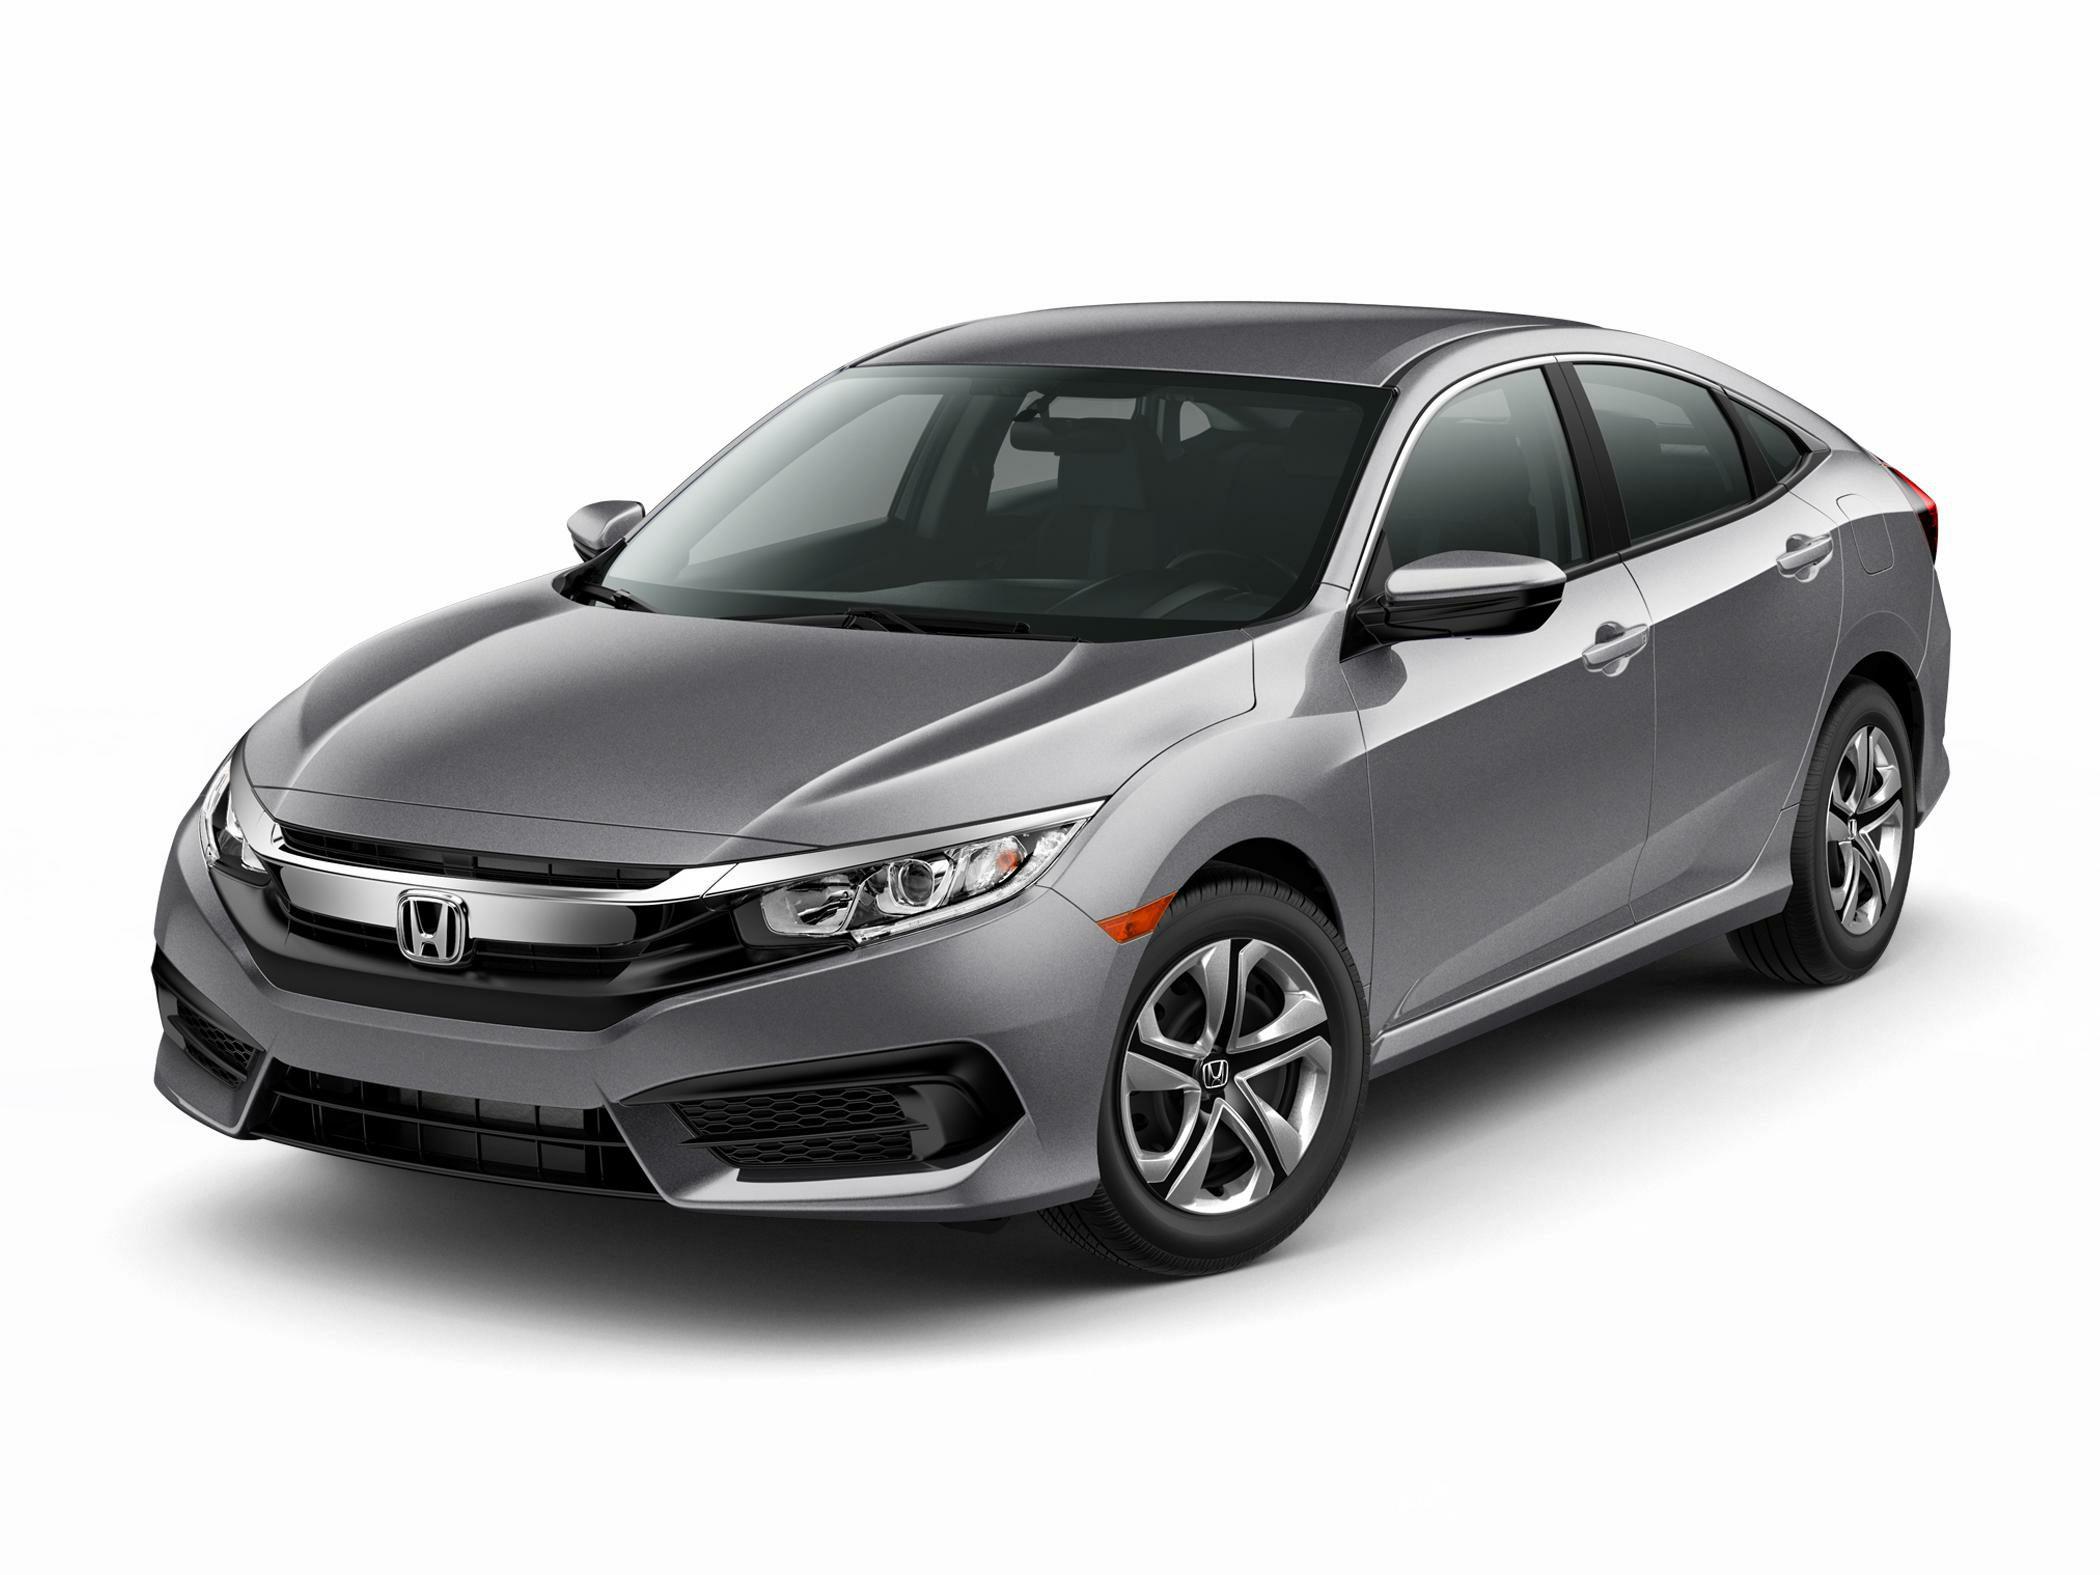 Honda Civic IX Restyling 2013 - 2016 Station wagon 5 door #4